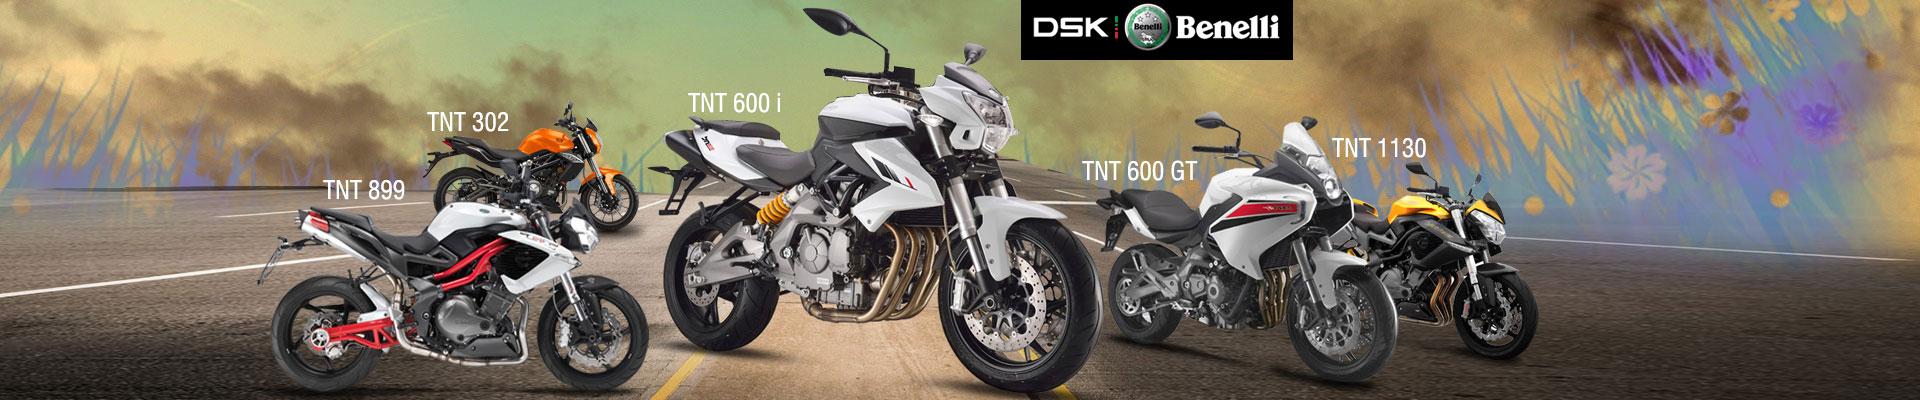 DSK Benelli New Bikes